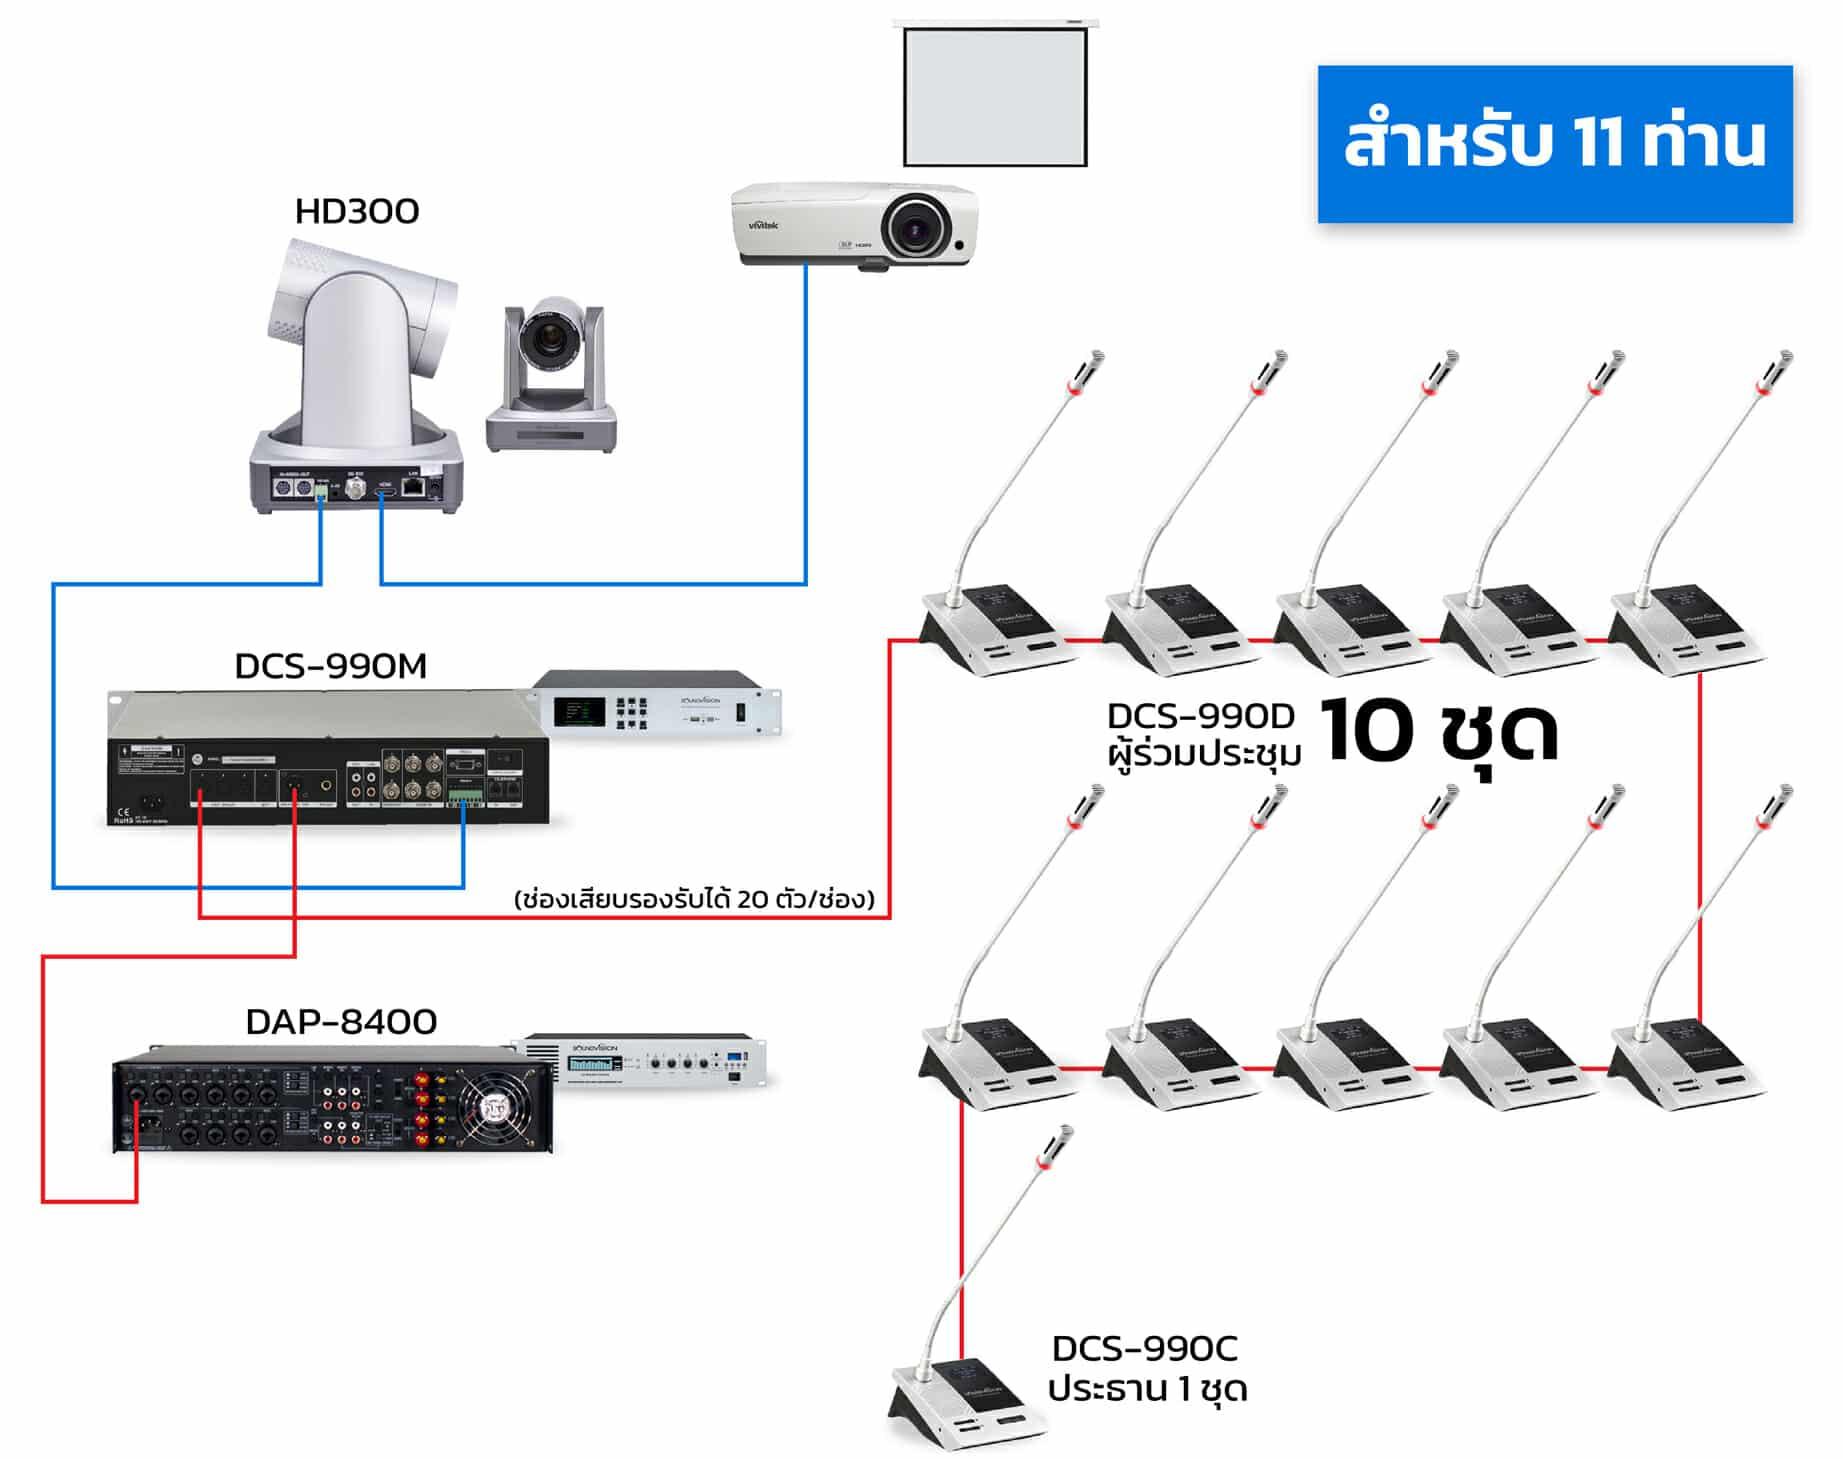 SOUNDVISION DCS-990